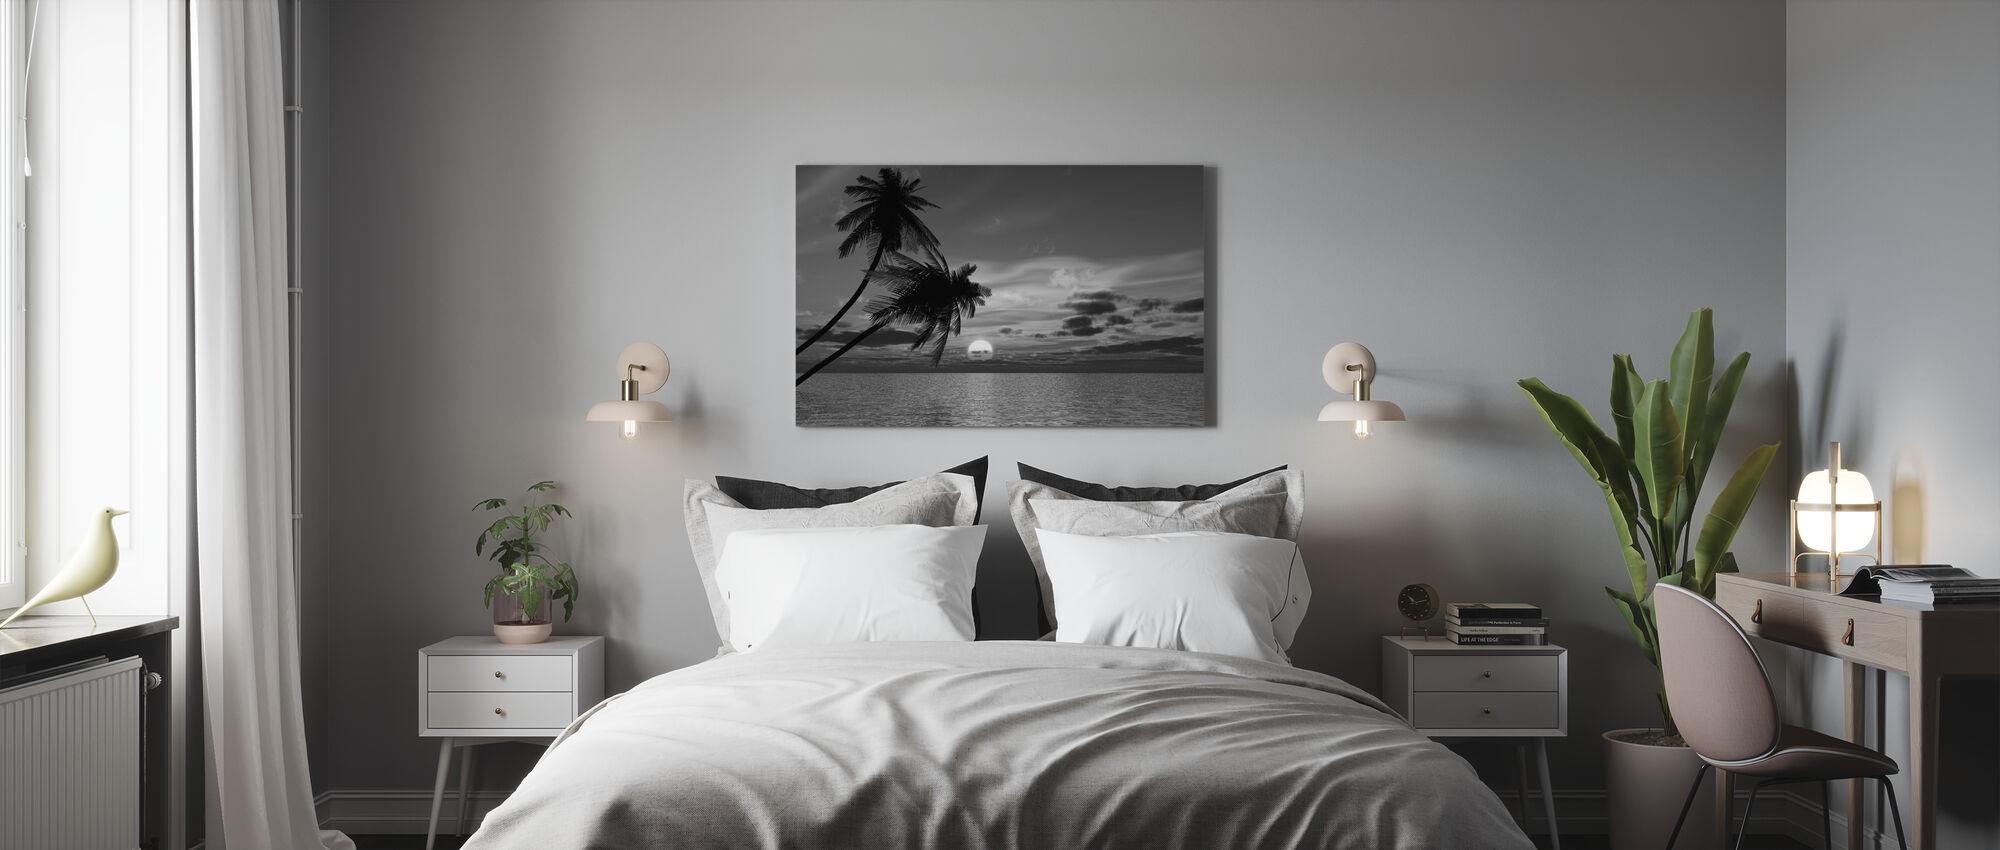 Kokos Palm Sol - Lerretsbilde - Soverom